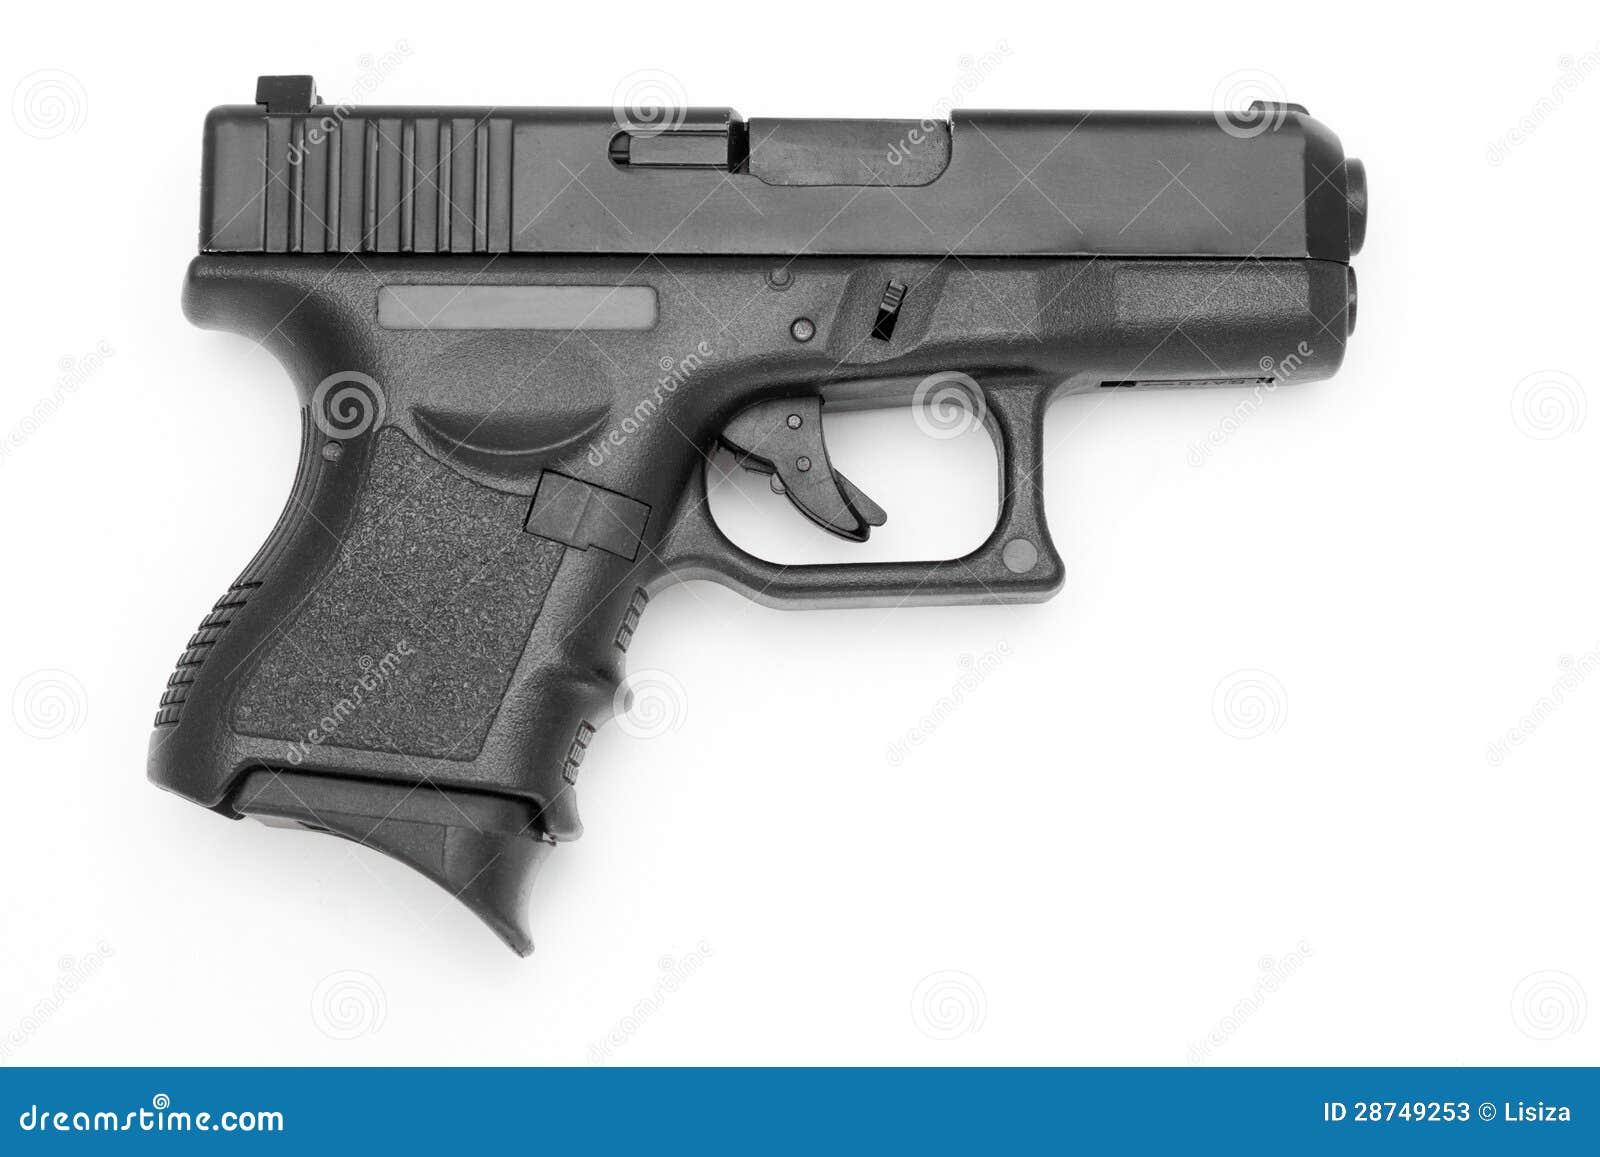 gun white background - photo #1